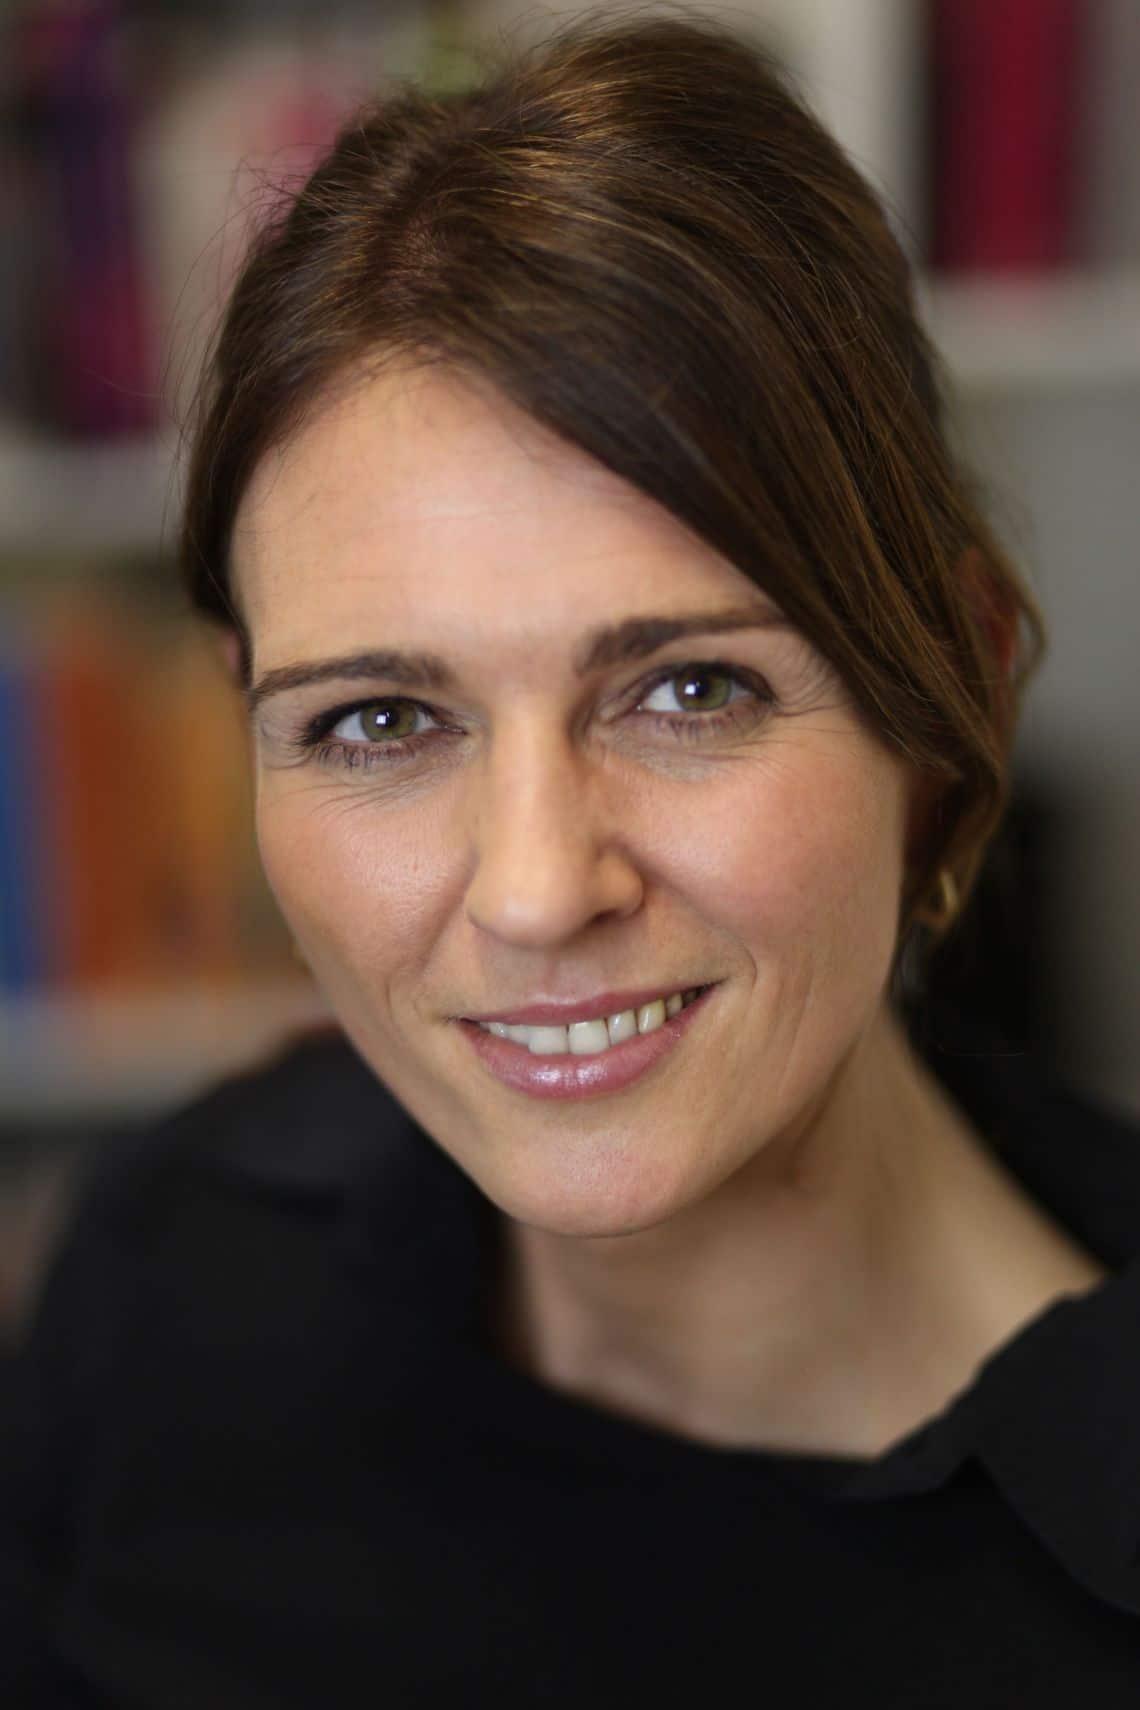 Andrea Montua (c) Kay Schmedes, Reinbek